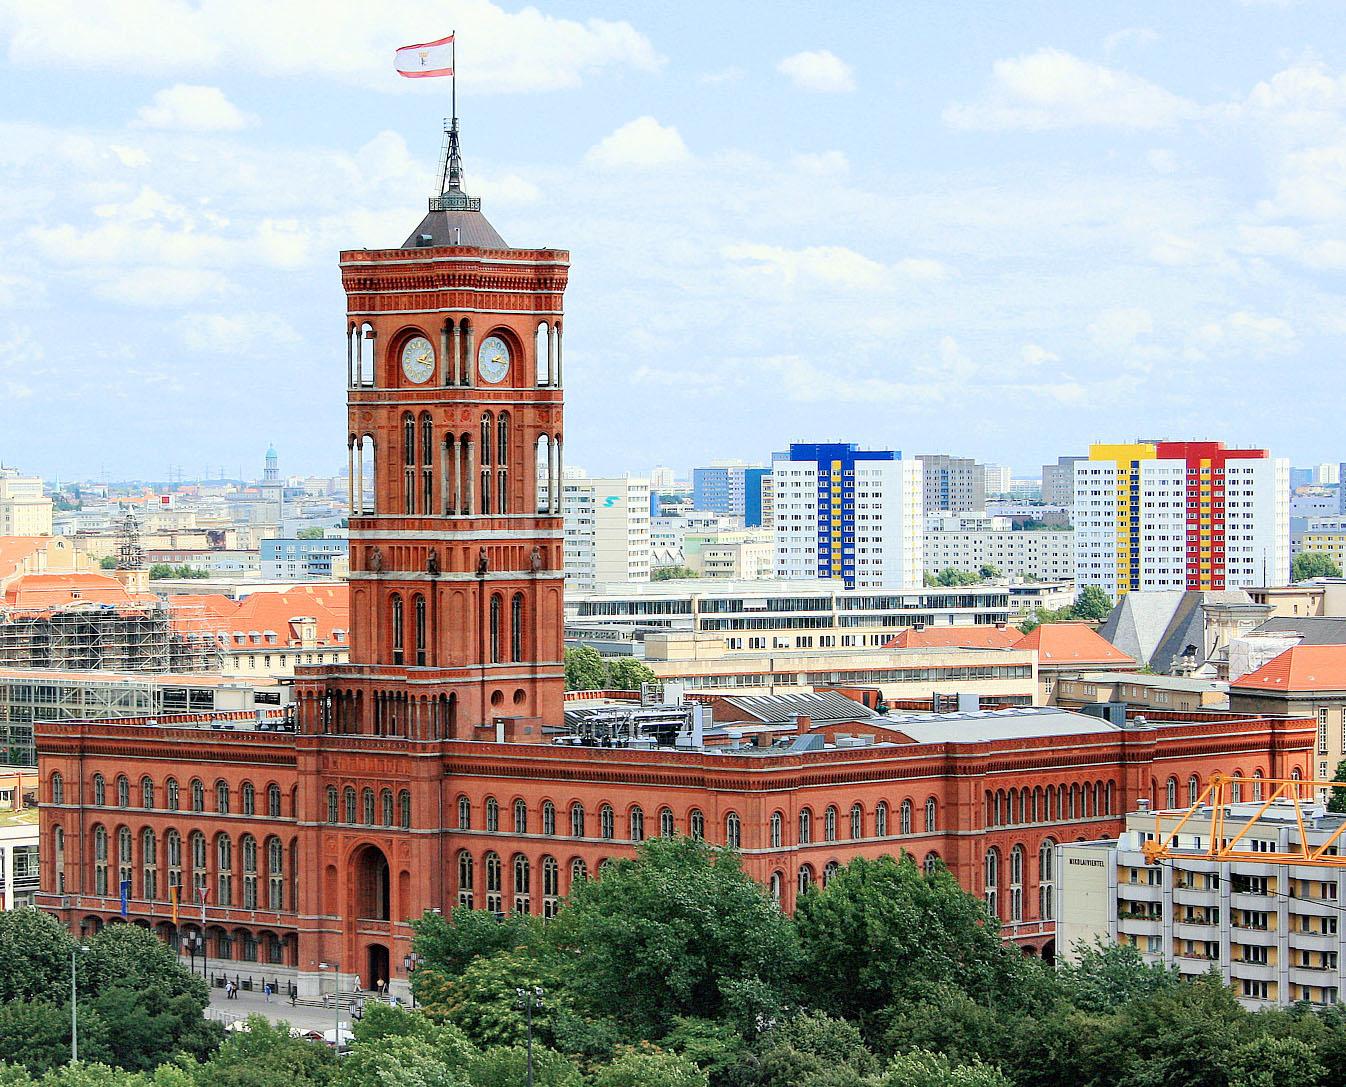 Rotes_Rathaus_Berlin_klein